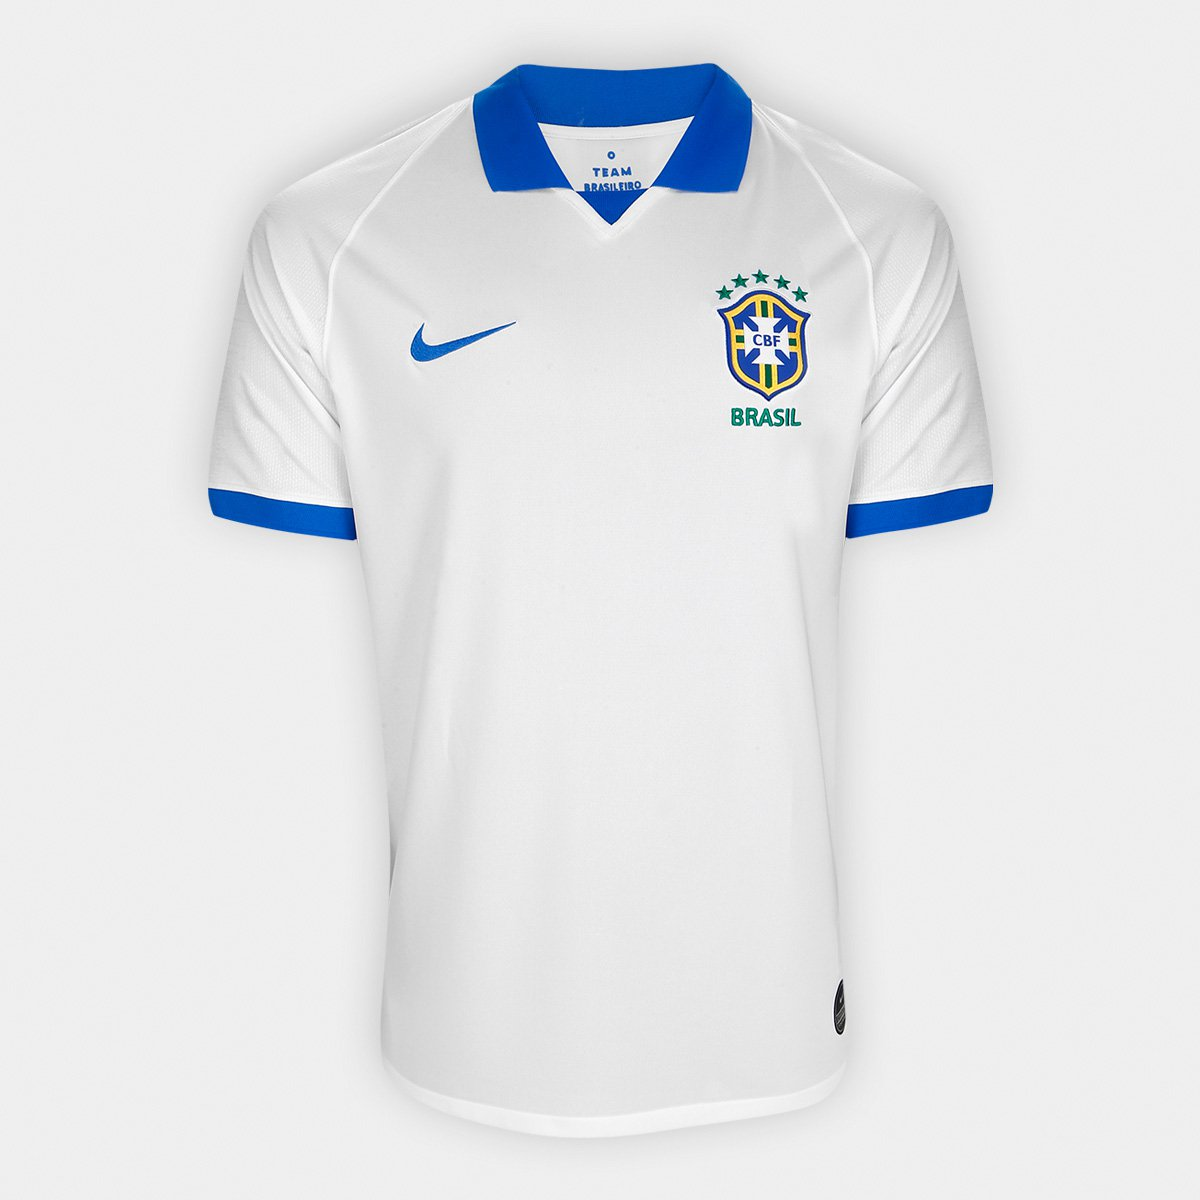 Camisa Seleção Brasil III 19/20 s/nº Torcedor Nike Masculina - Tam: M